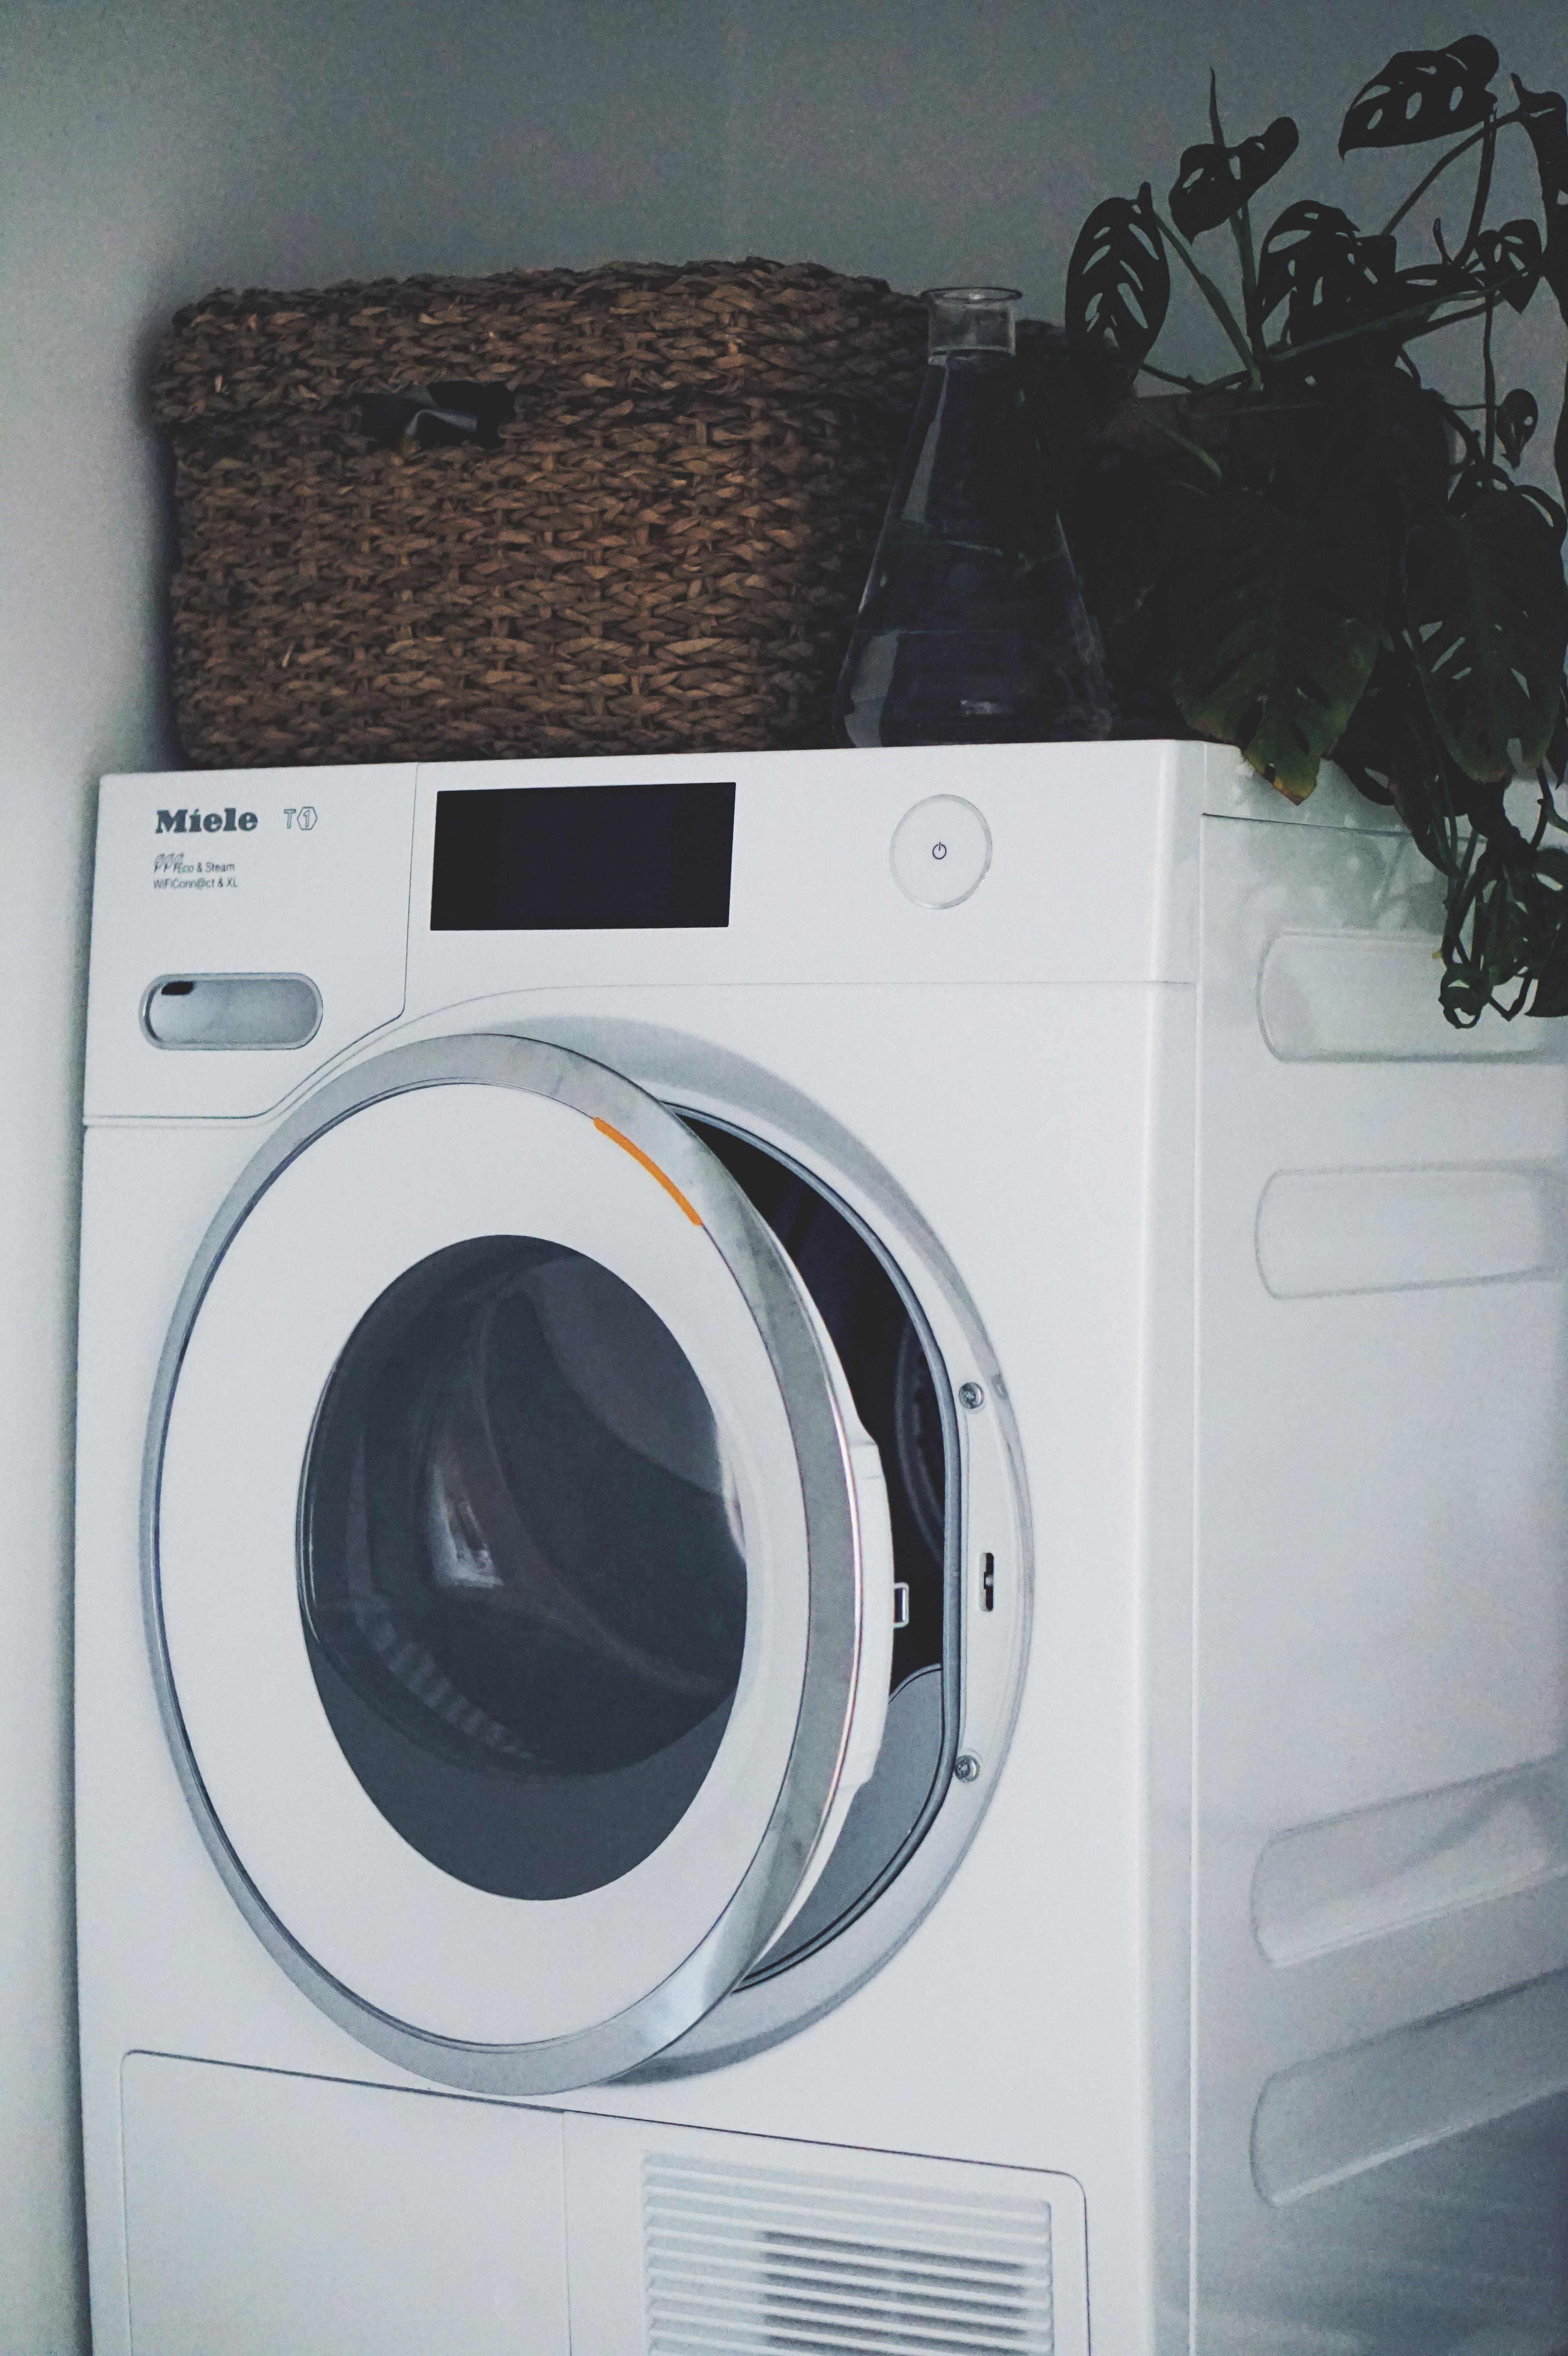 Huskøb: Livet med bryggers og <strong>Mieles</strong> vaskemaskine og tørretumbler 9